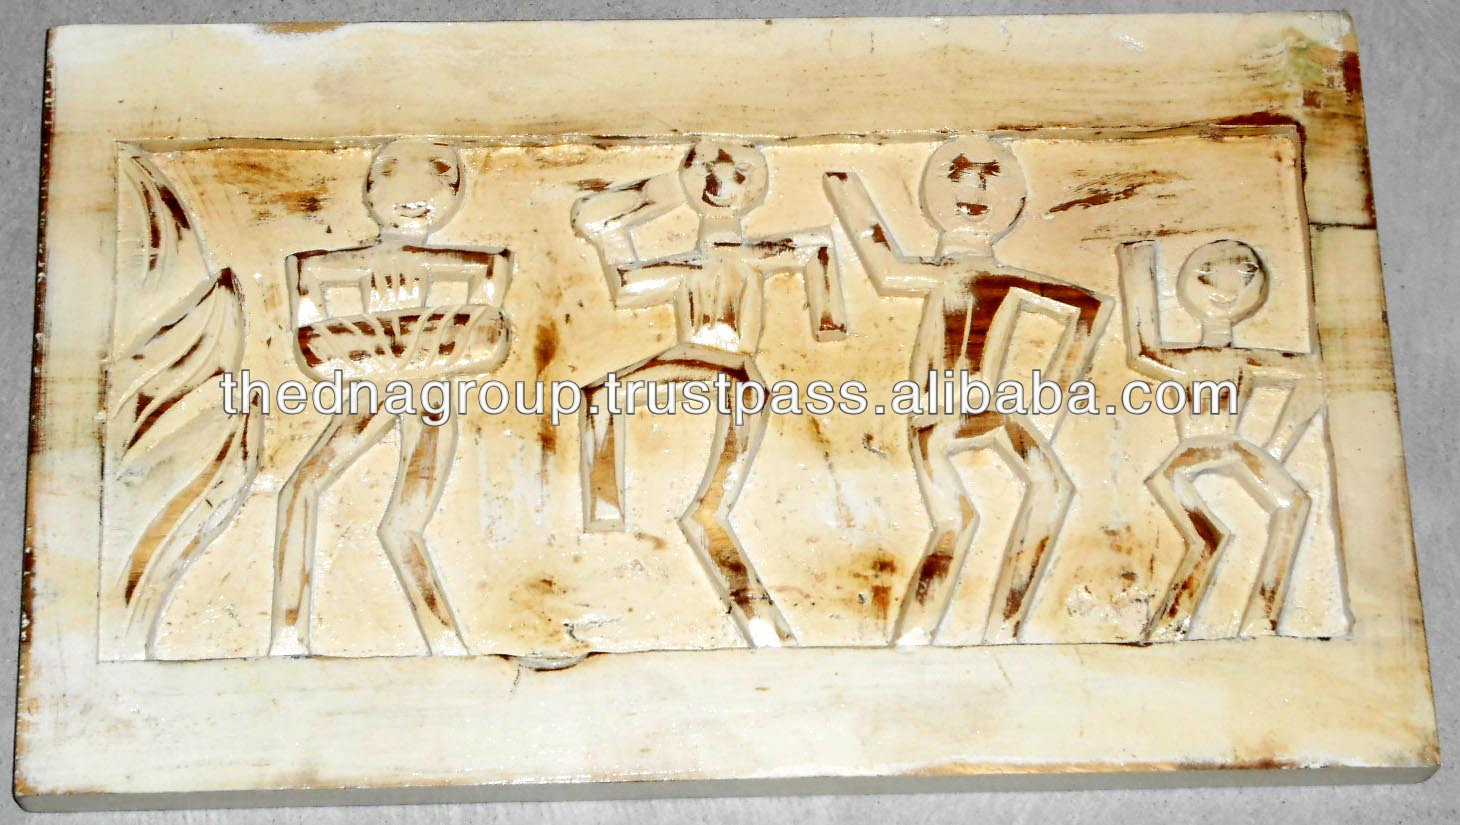 India wood carving wall art wholesale 🇮🇳 - Alibaba